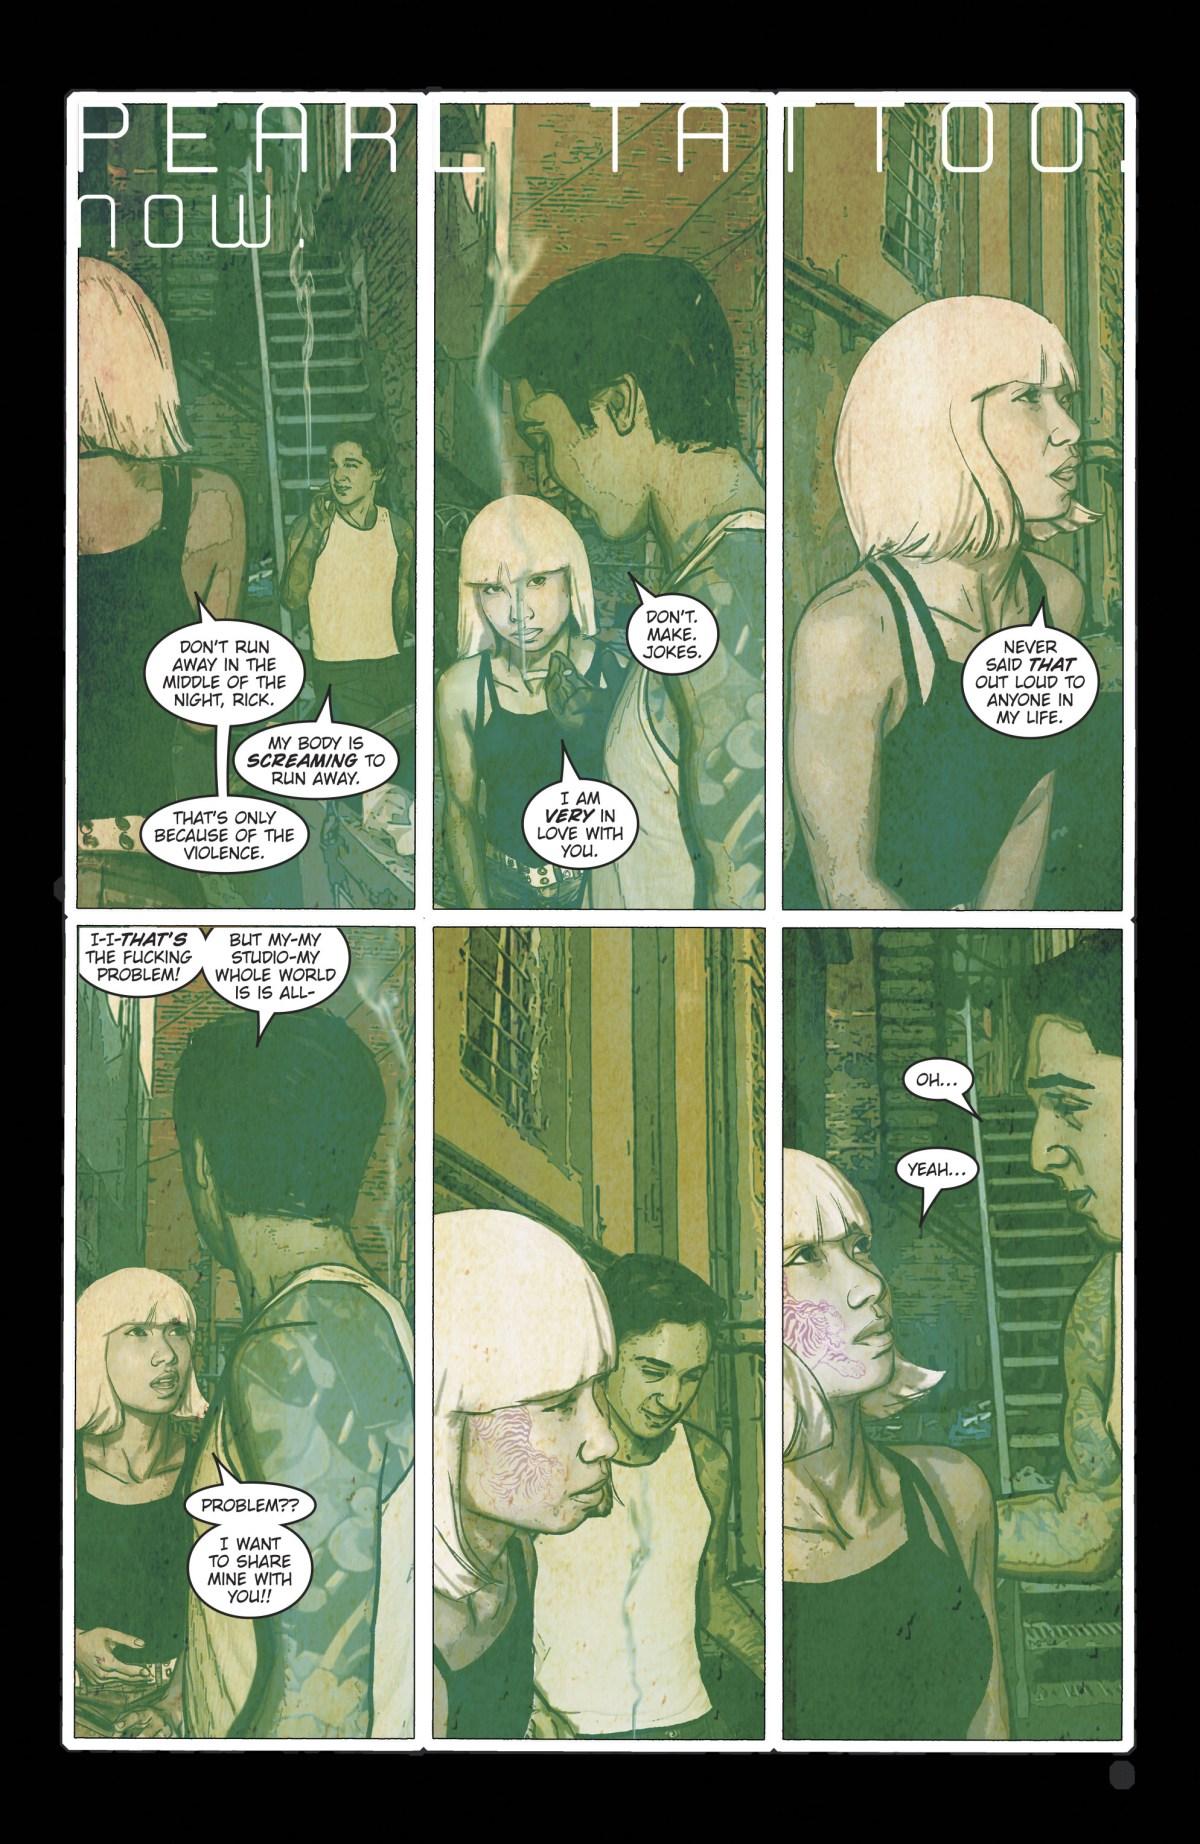 Pearl and Rick talk